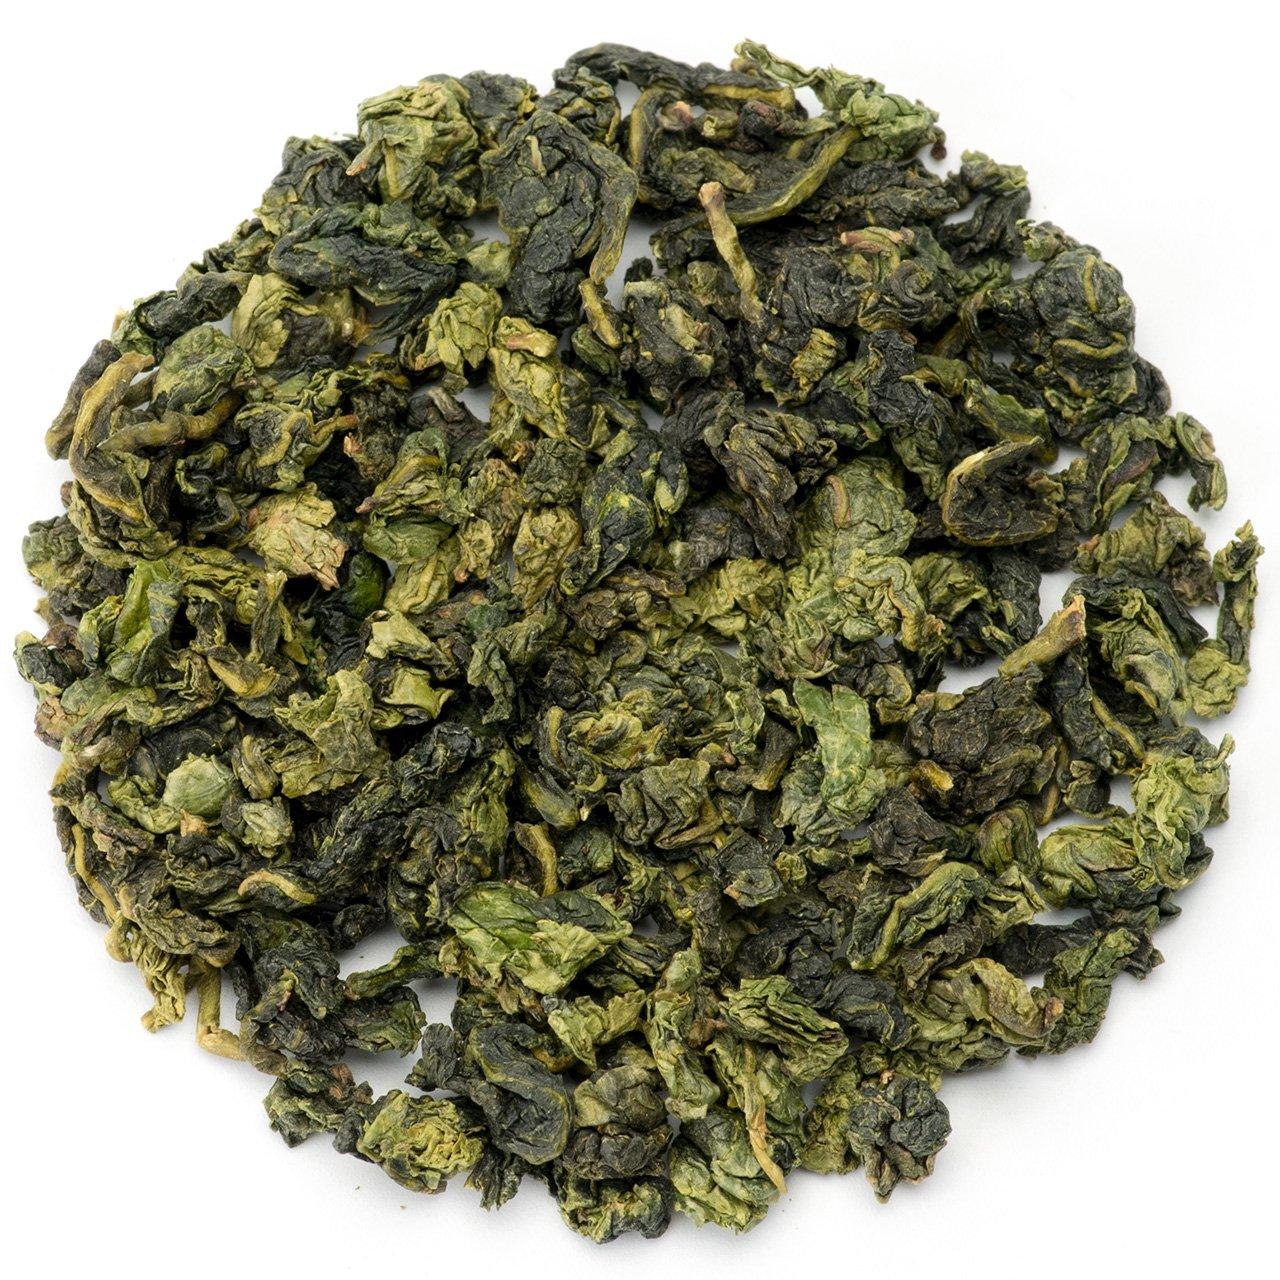 Teavivre Anxi Tie Guan Yin Oolong Tea, Iron Goddess of Mercy, Loose Leaf Chinese Tea - 3.5oz / 100g by Teavivre